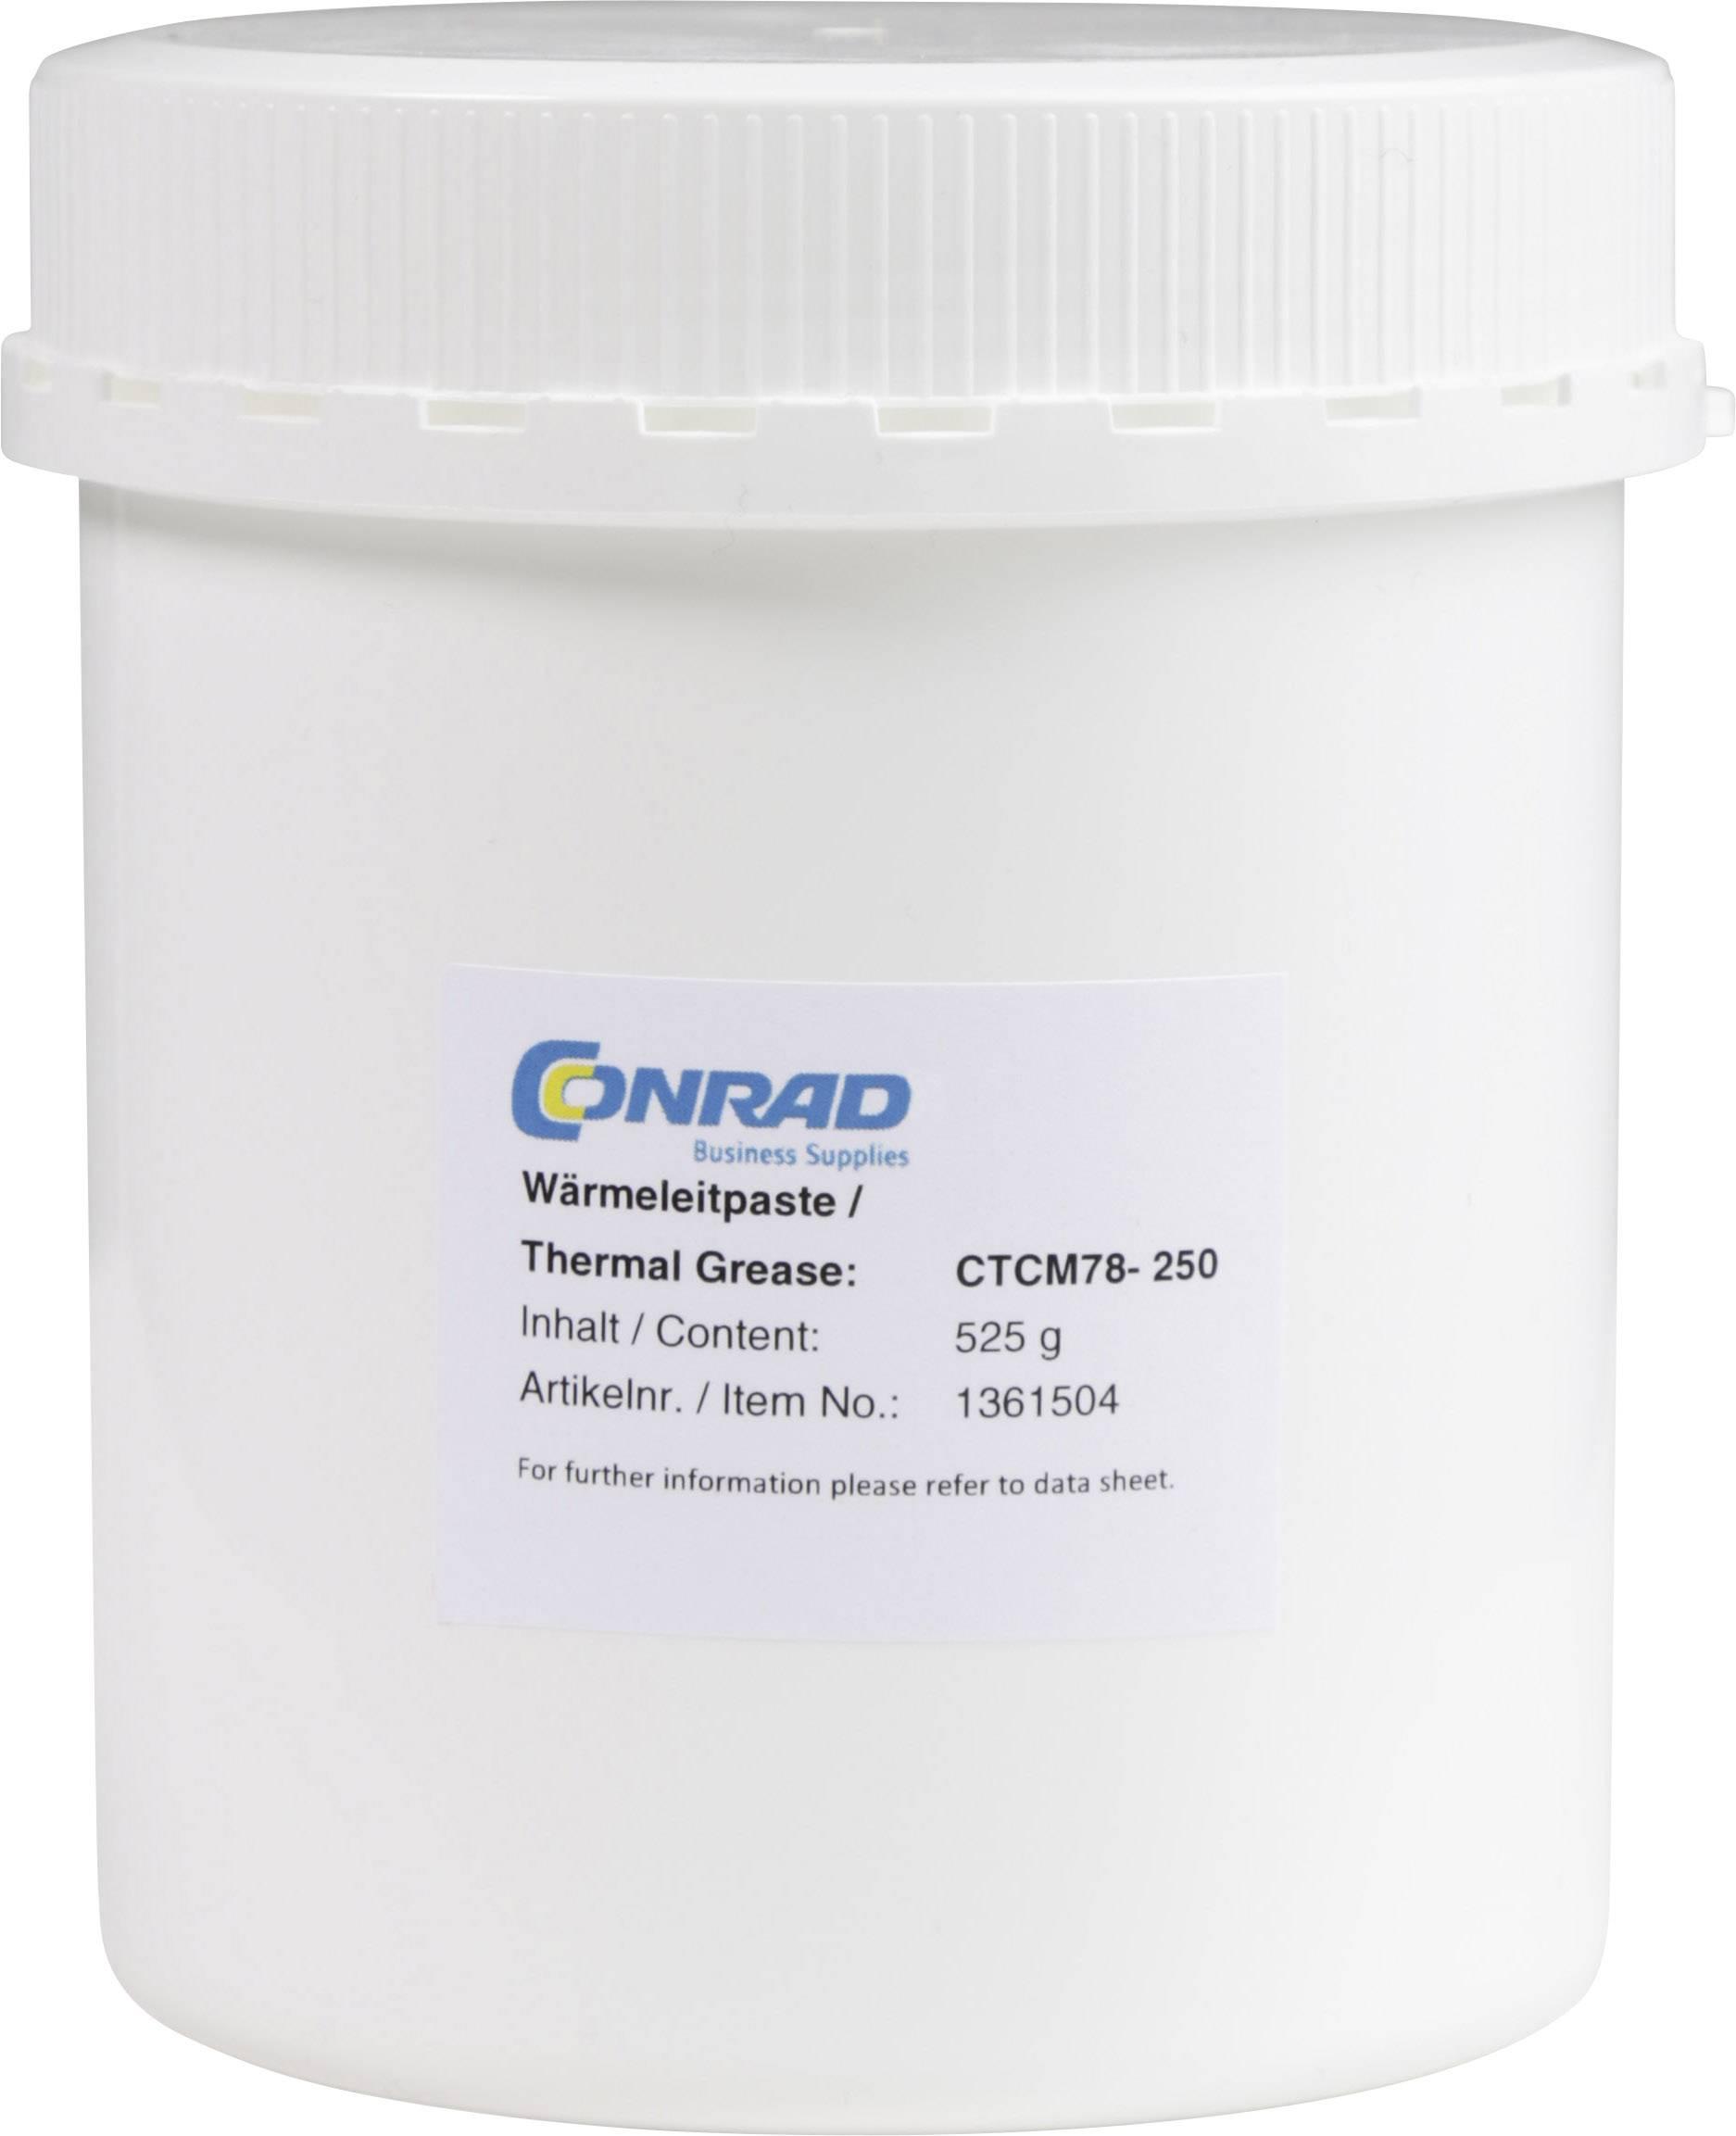 Teplovodivá pasta Conrad CTCM78-250, 7,8 W / mK, 525 g